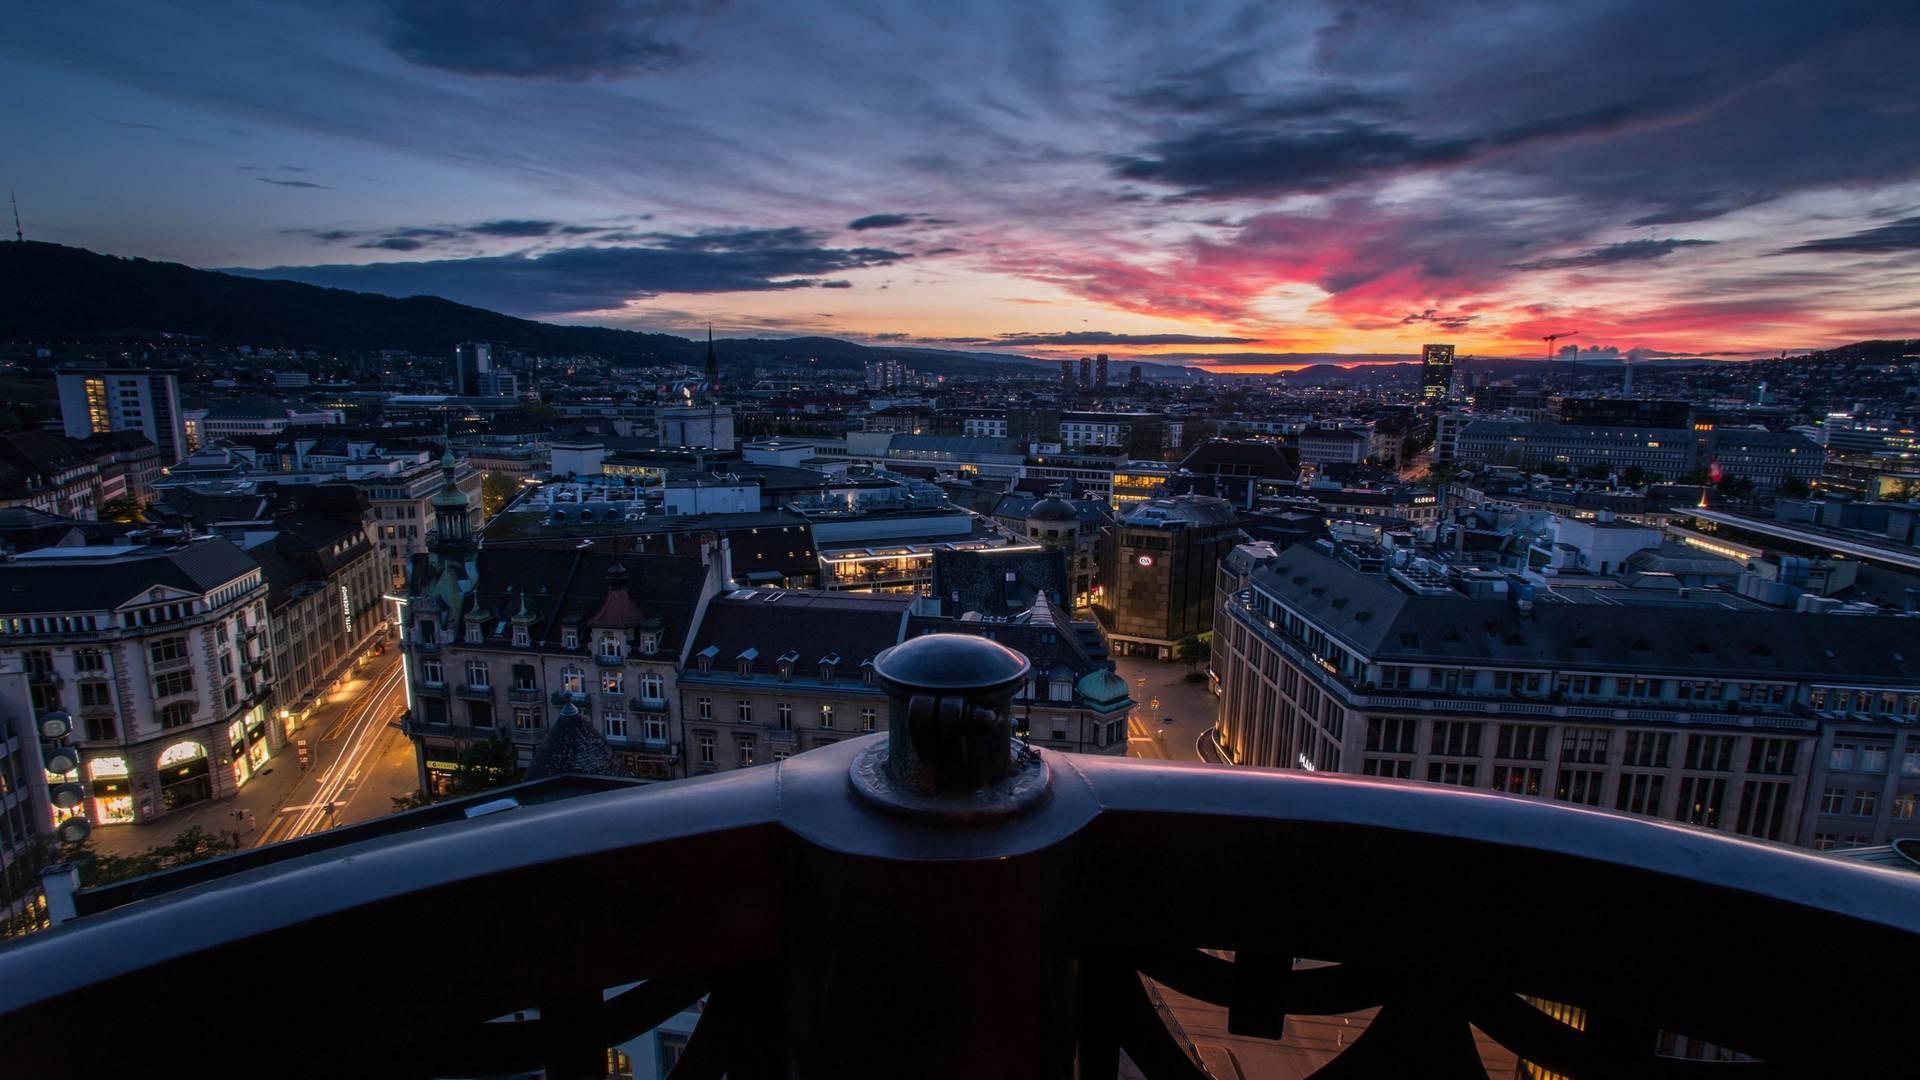 Обои швецария, цюрих, балкон, вечер на телефон картинки unde.